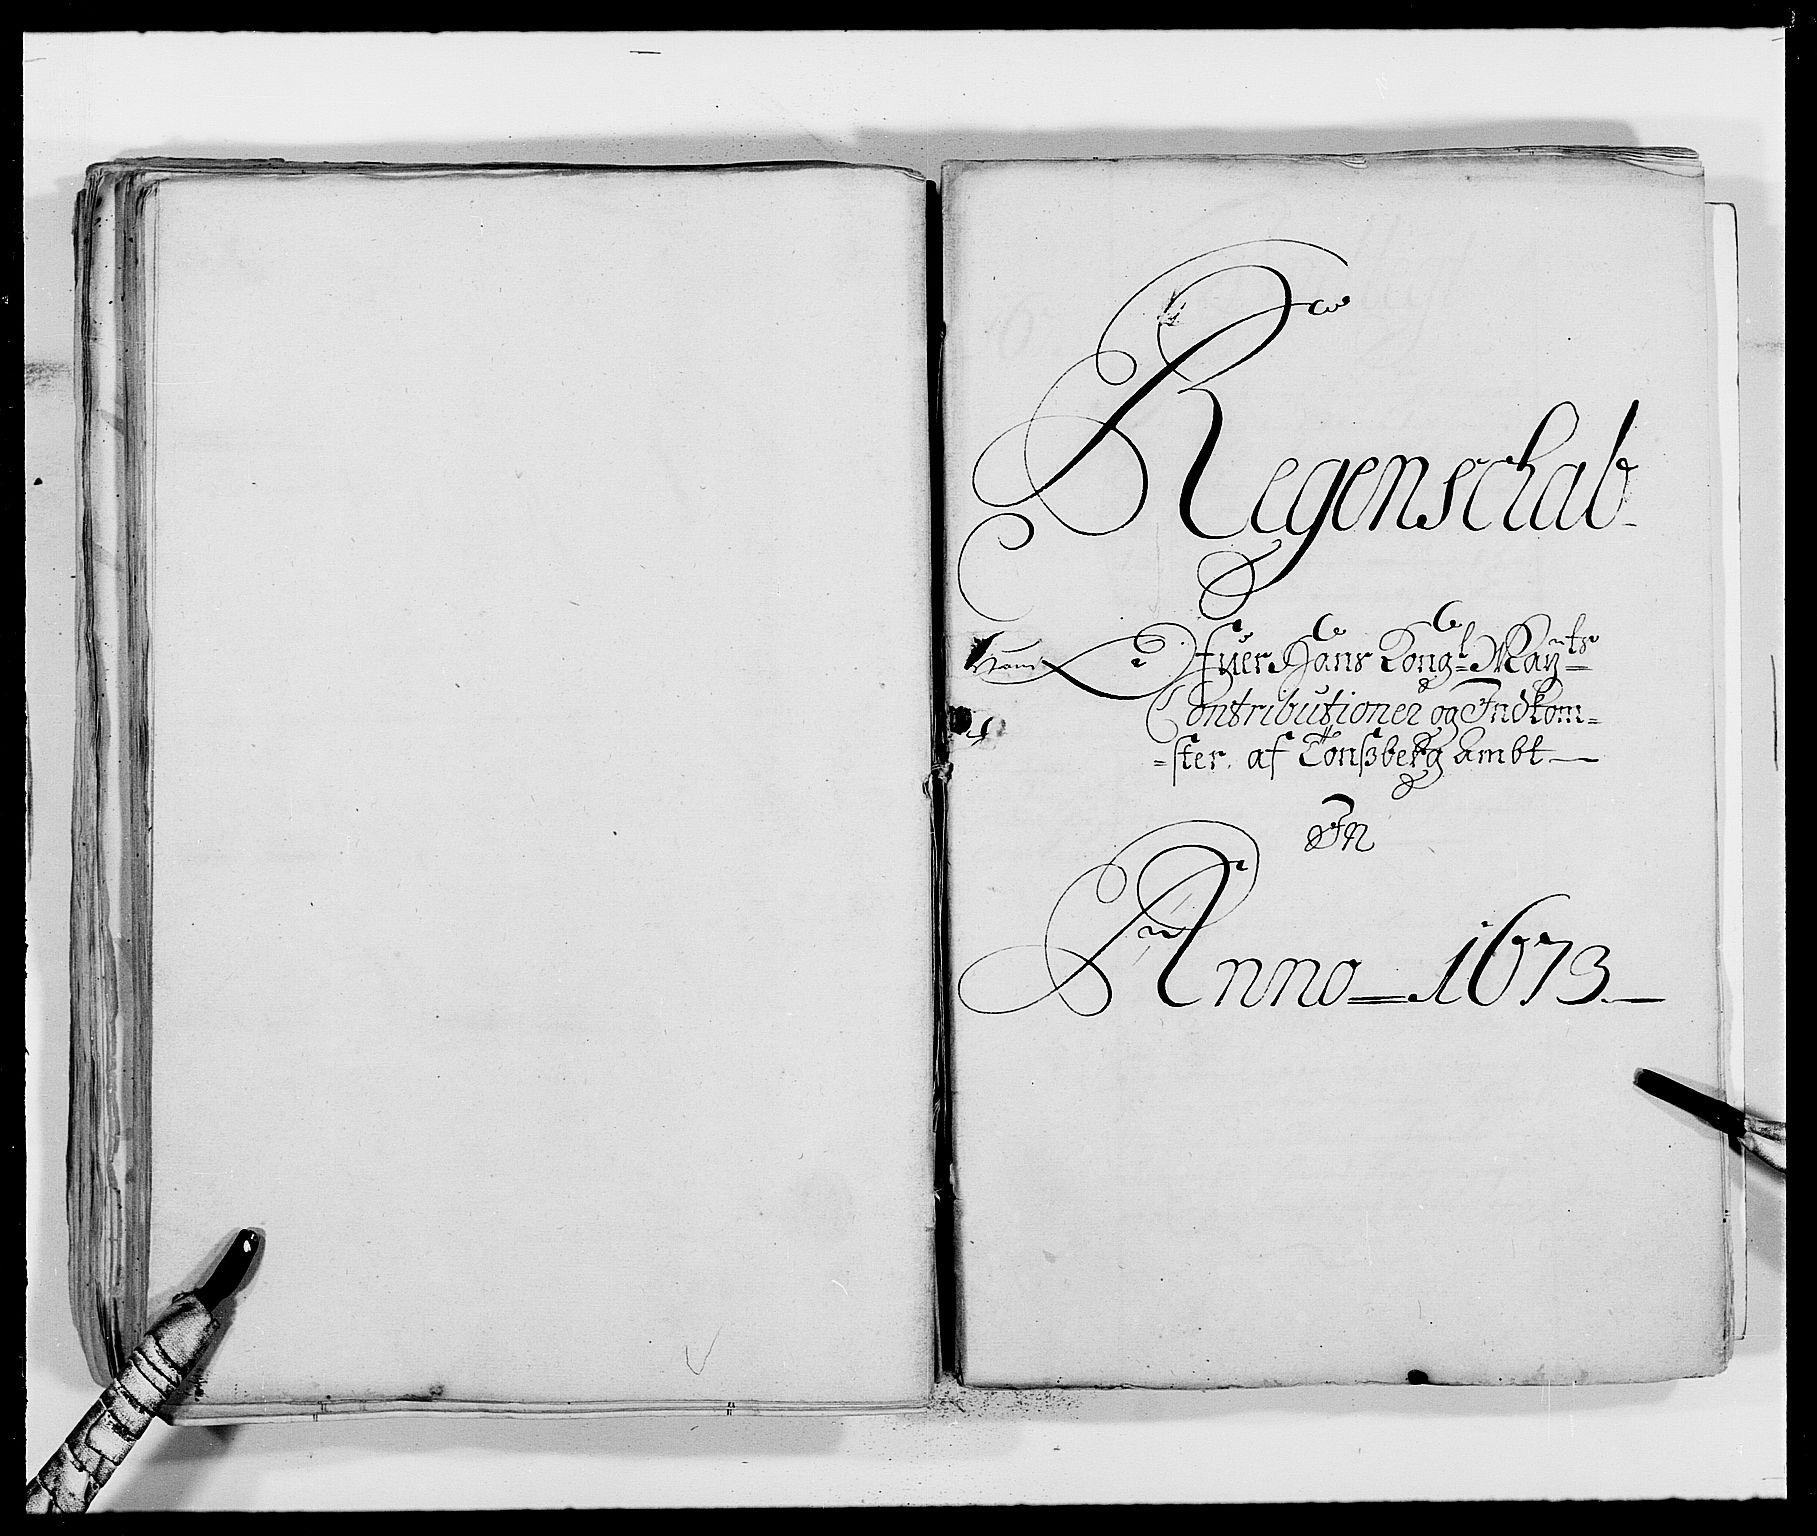 RA, Rentekammeret inntil 1814, Reviderte regnskaper, Fogderegnskap, R32/L1839: Fogderegnskap Jarlsberg grevskap, 1664-1673, s. 131